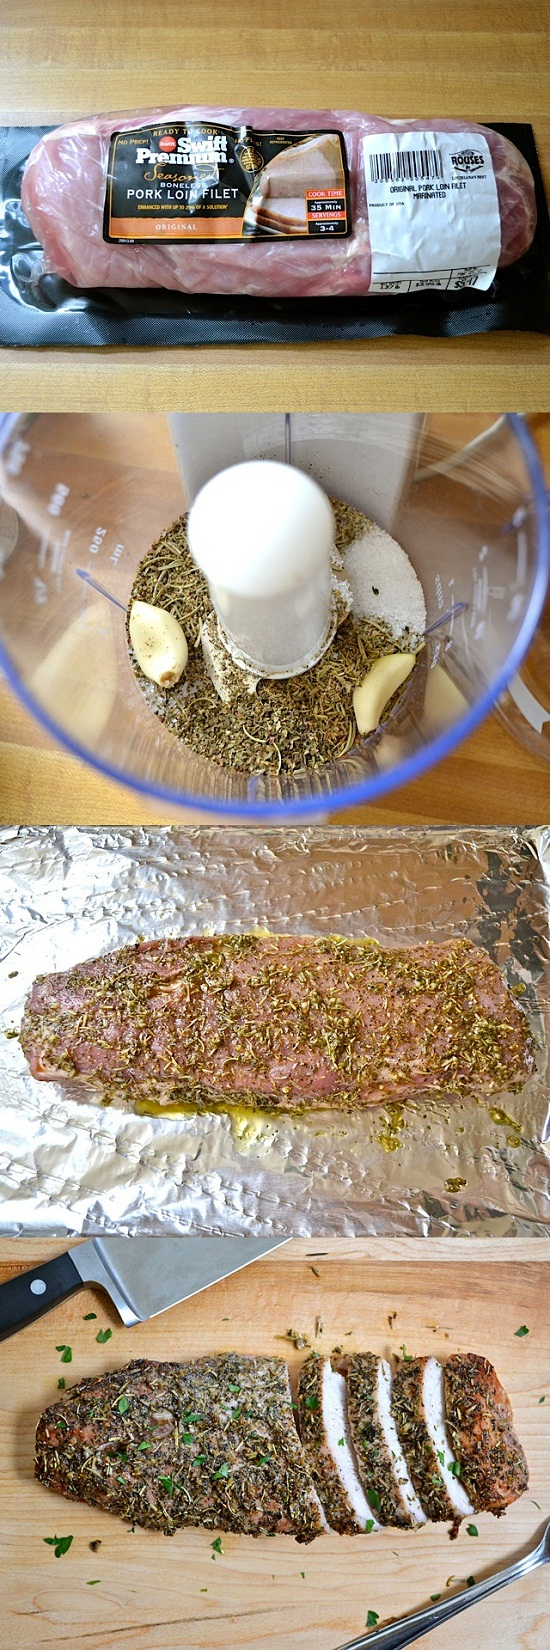 herb-roasted-pork-loin-Recipe